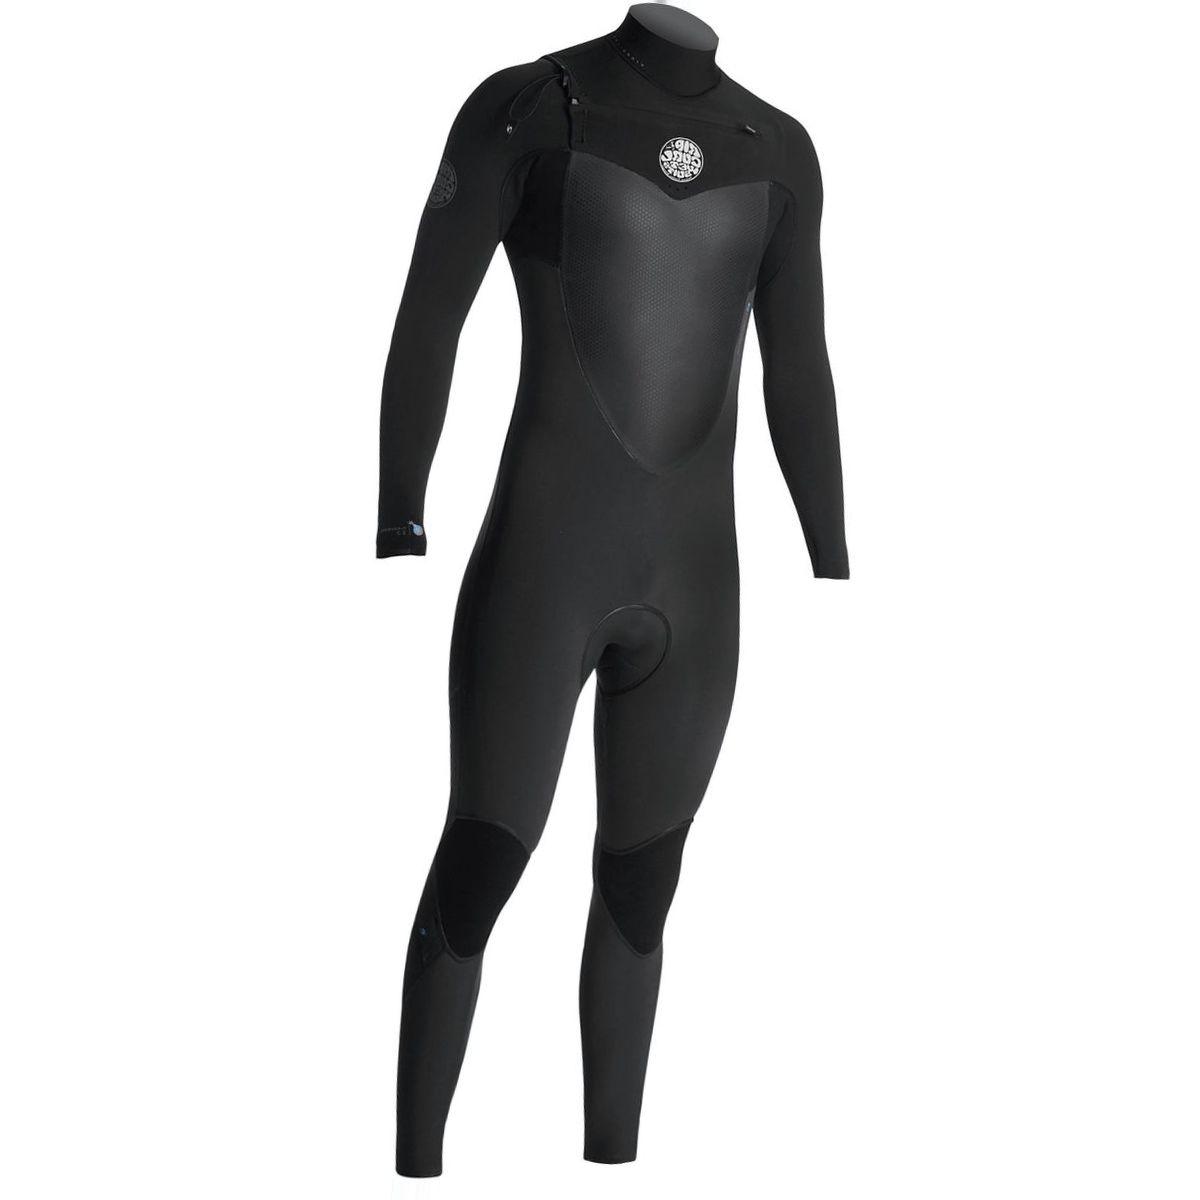 Rip Curl Flashbomb 4/3 GB Chest-Zip Full Wetsuit - Men's